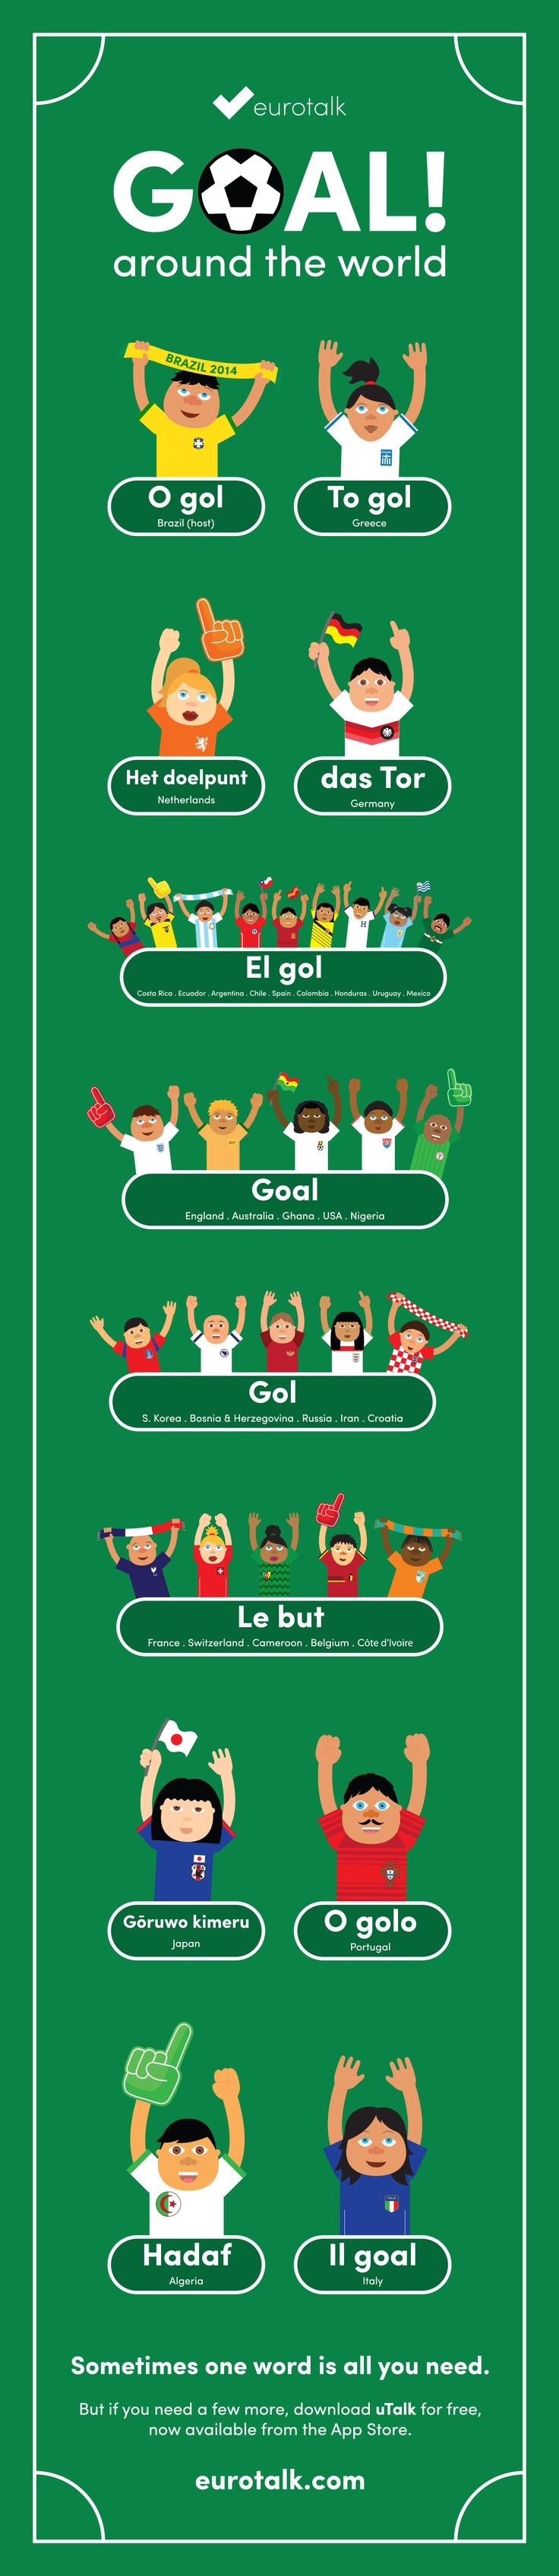 GOAL! Around the World  #Goal #Football #WorldCup2014 #Brasil